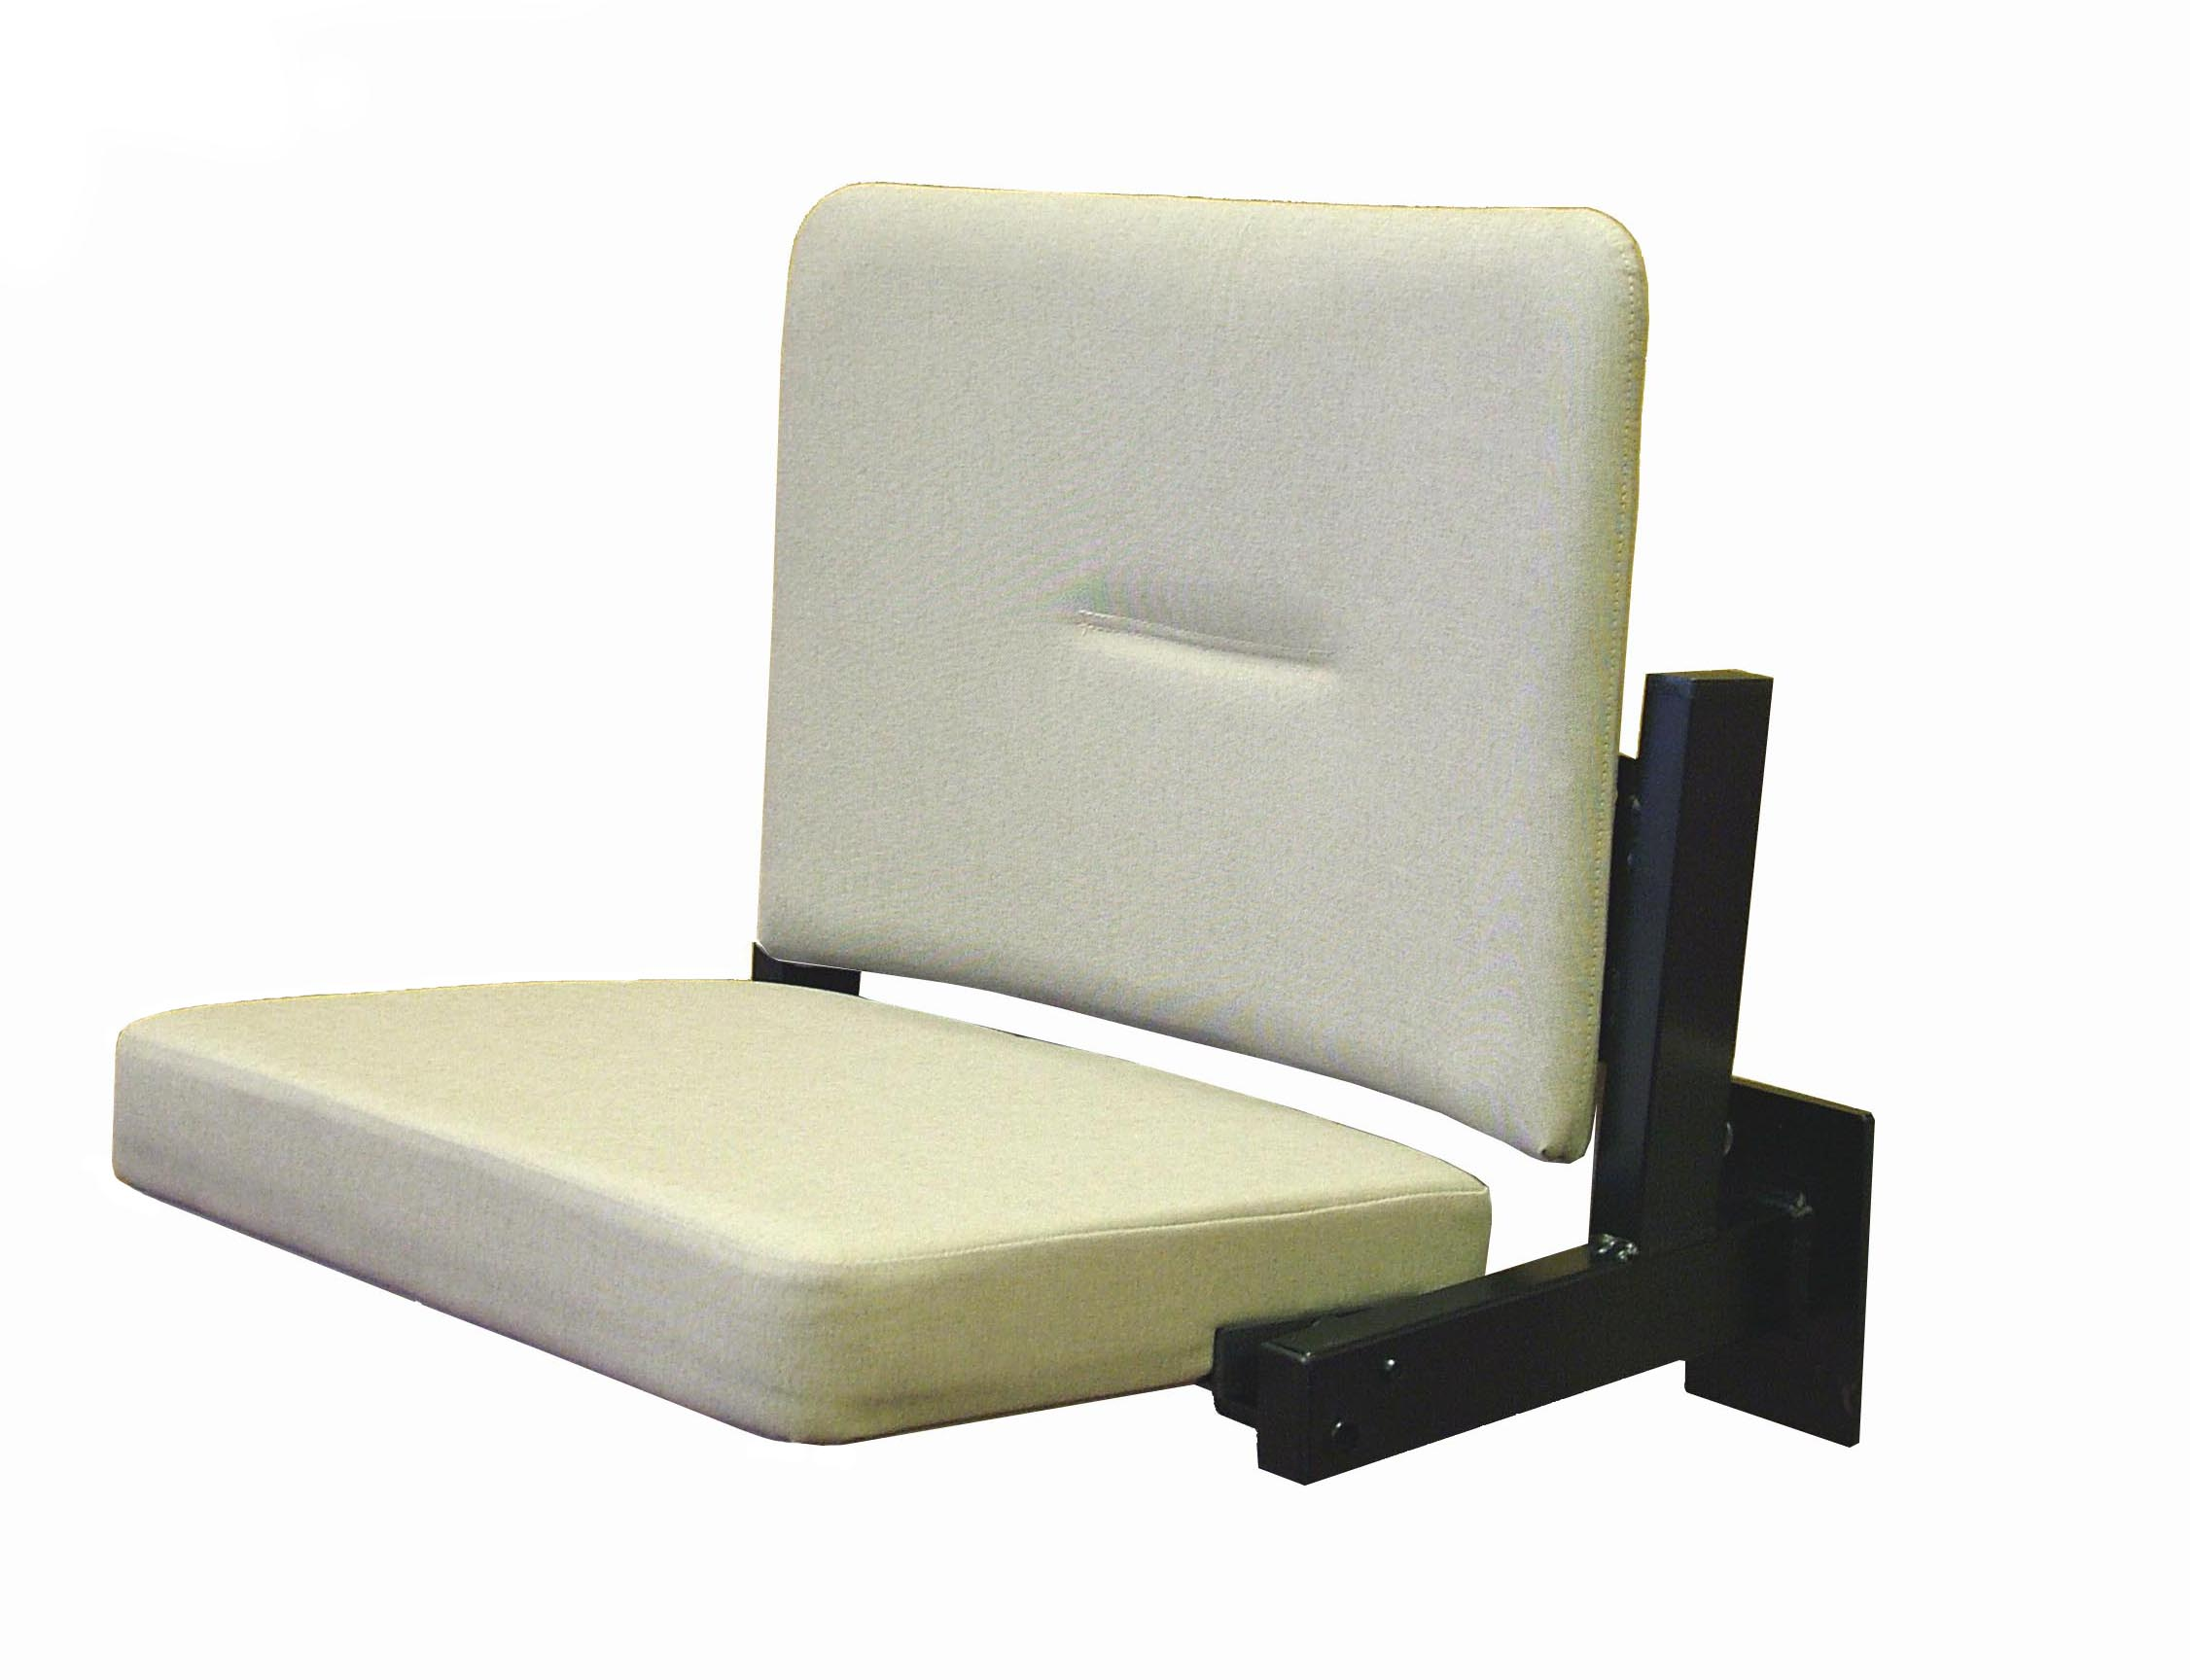 Solarushback DDA Seat